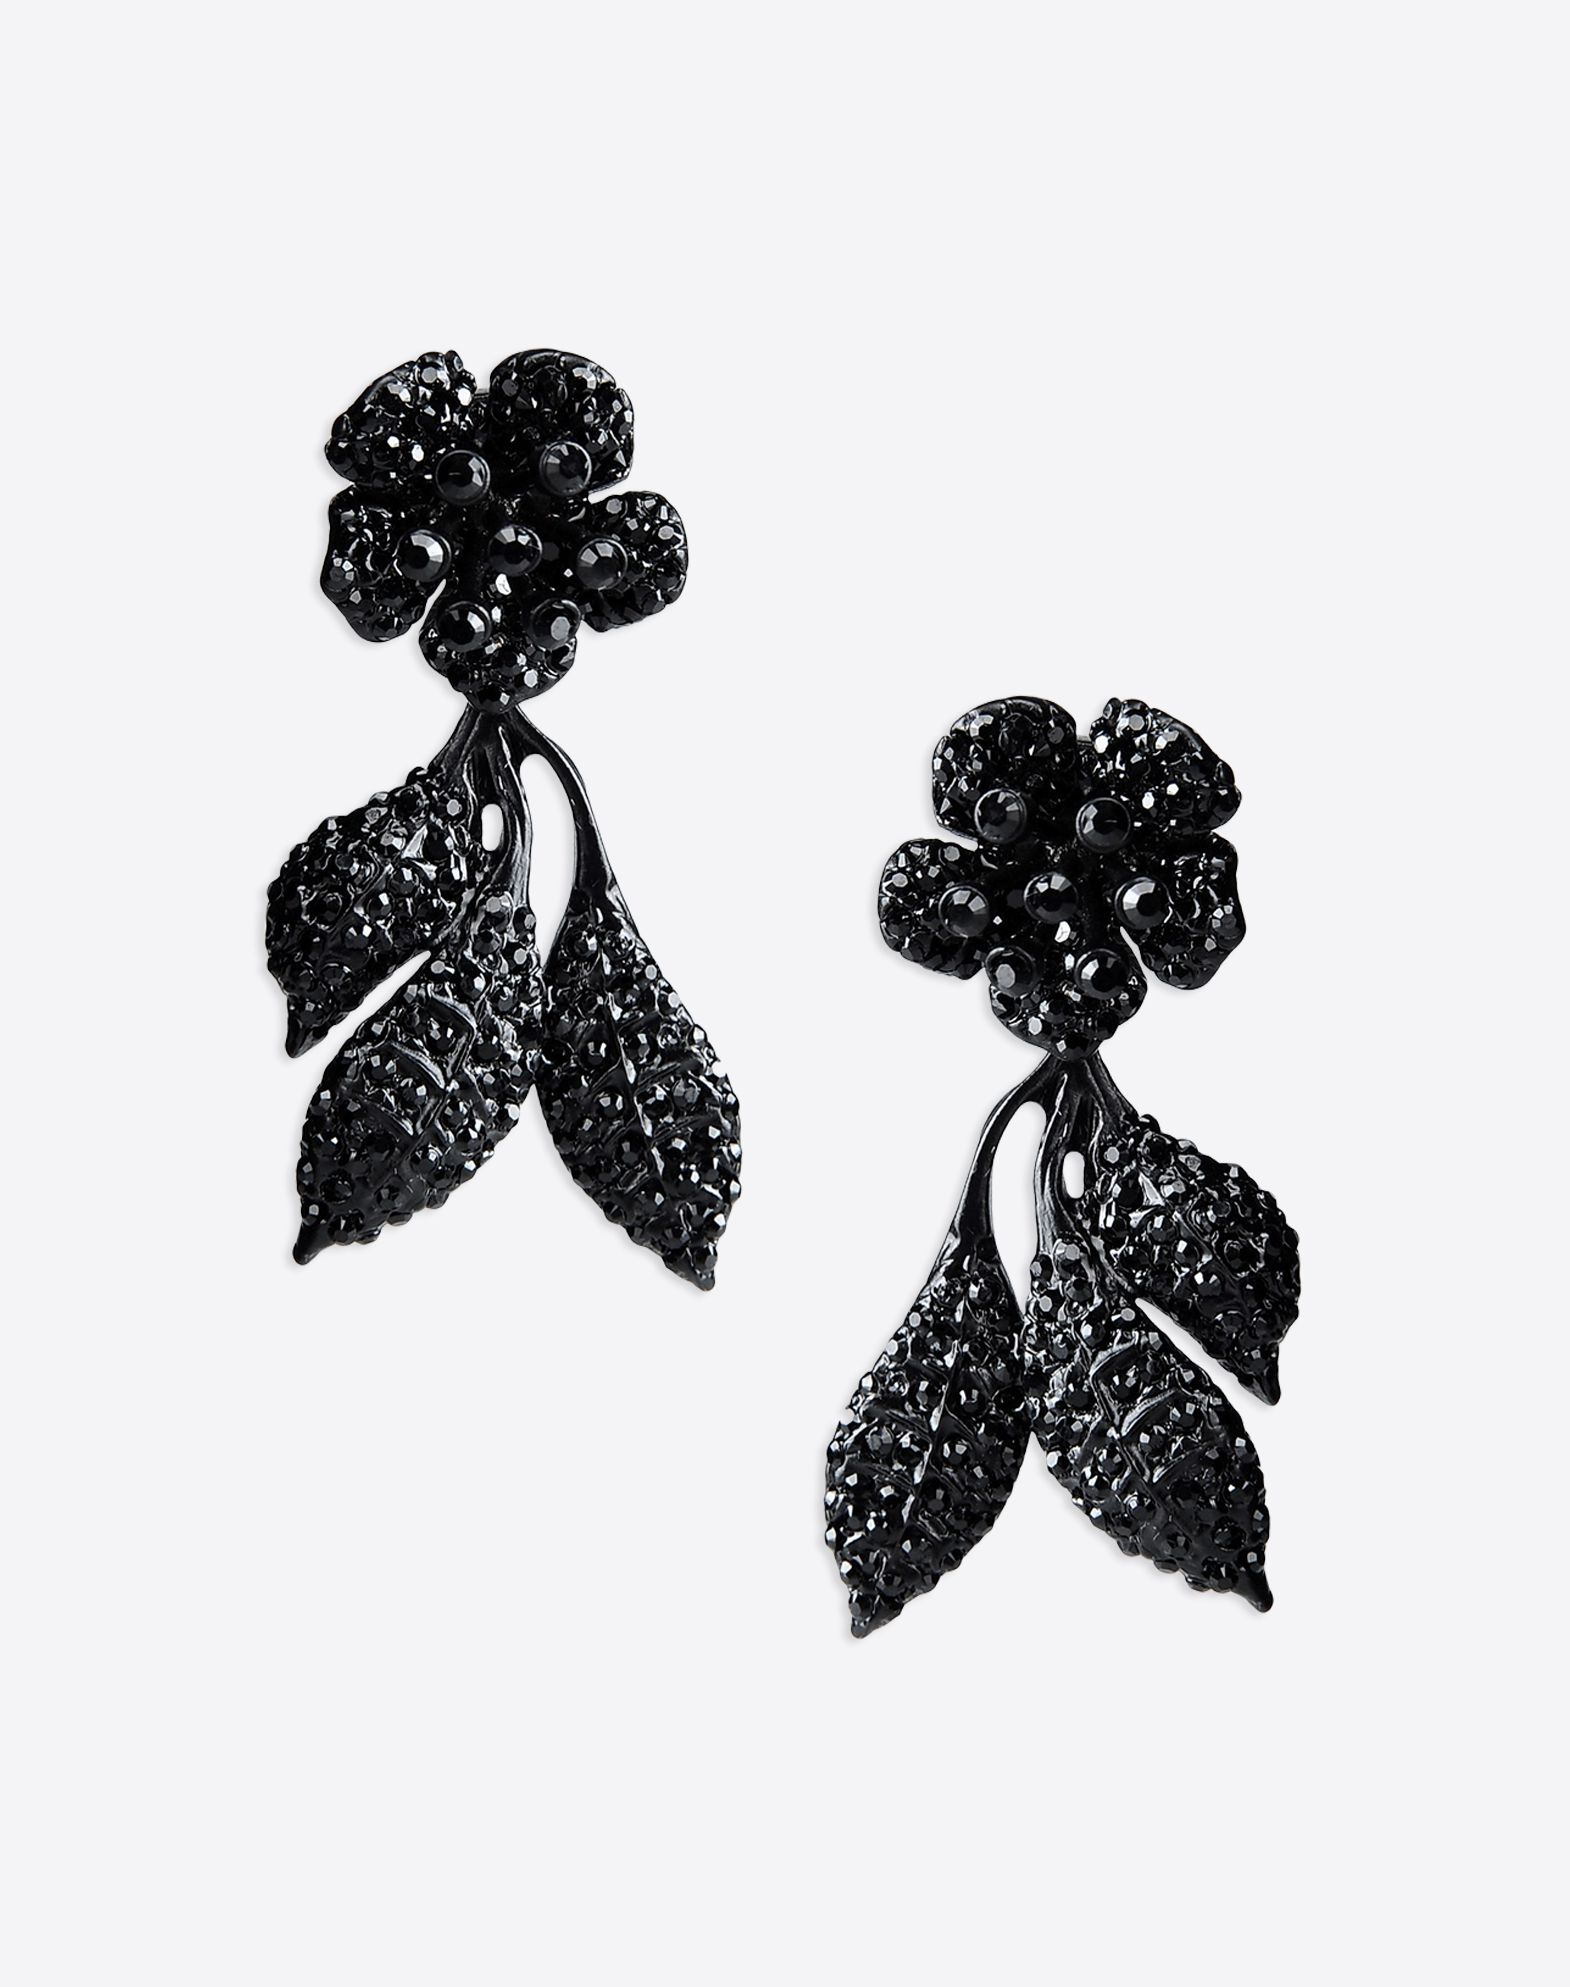 VALENTINO Valentino Garavani brass pendant flower earrings detailed with rhinestones  - Ruthenium-finish brass  - Black rhinestones  - Stud post back closure  - Pendant on the back  - Made in Italy 50172506fk